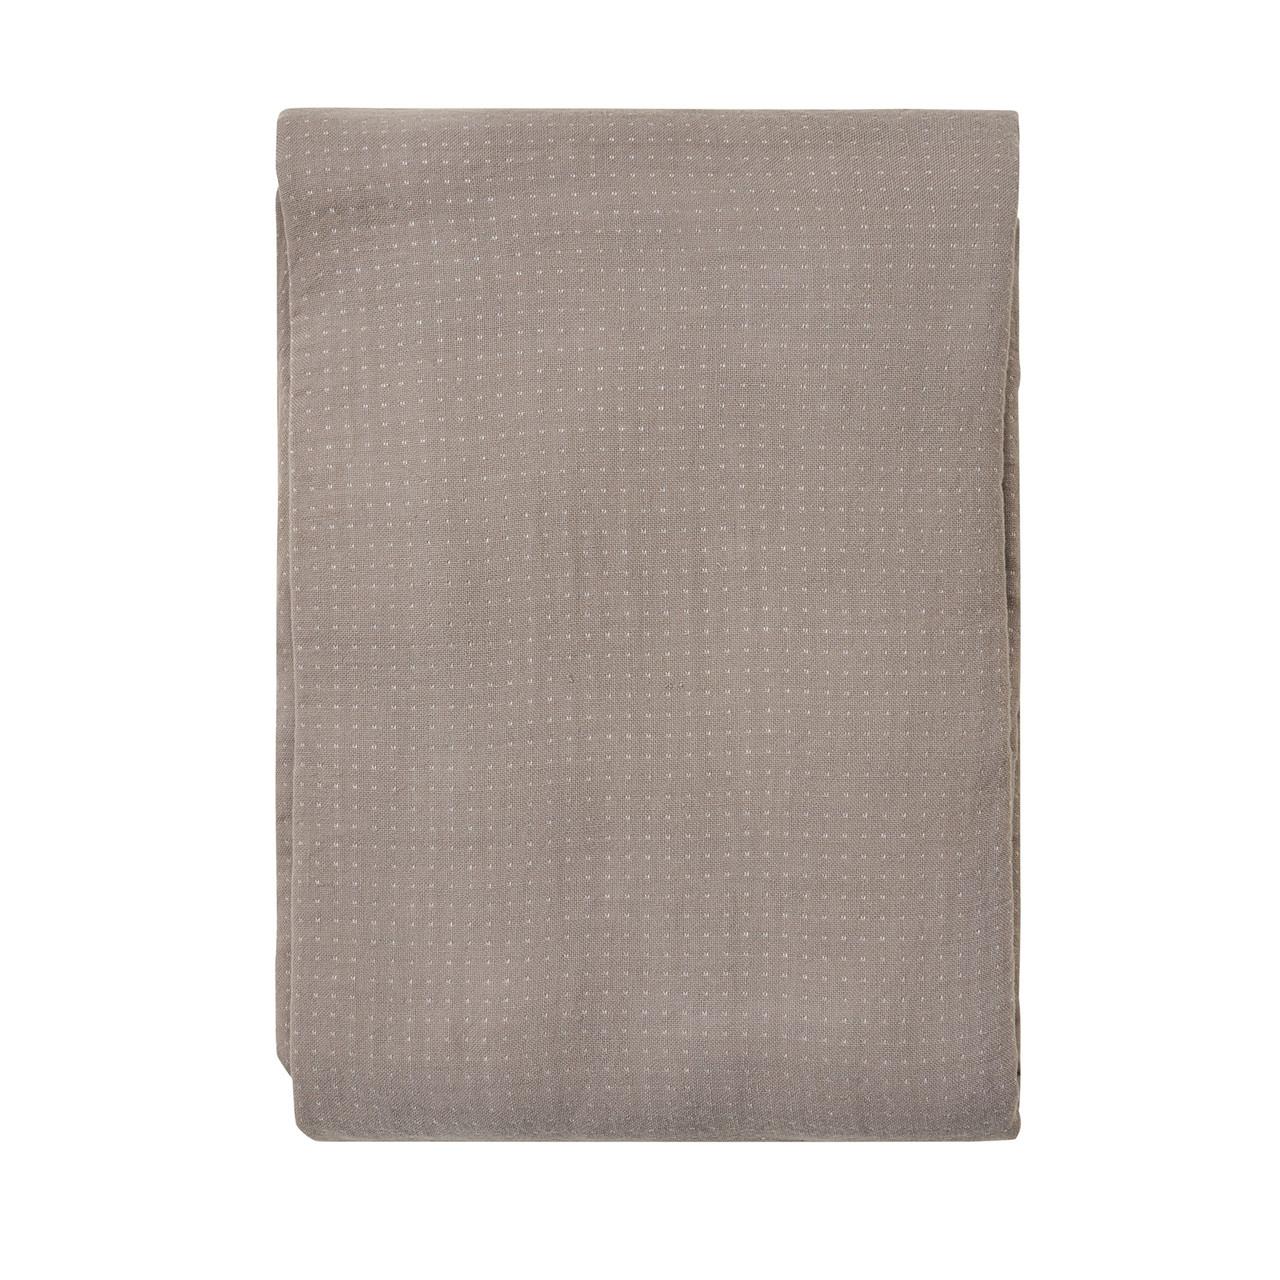 SÖDAHL Point sengetæppe 240x260 cm grå